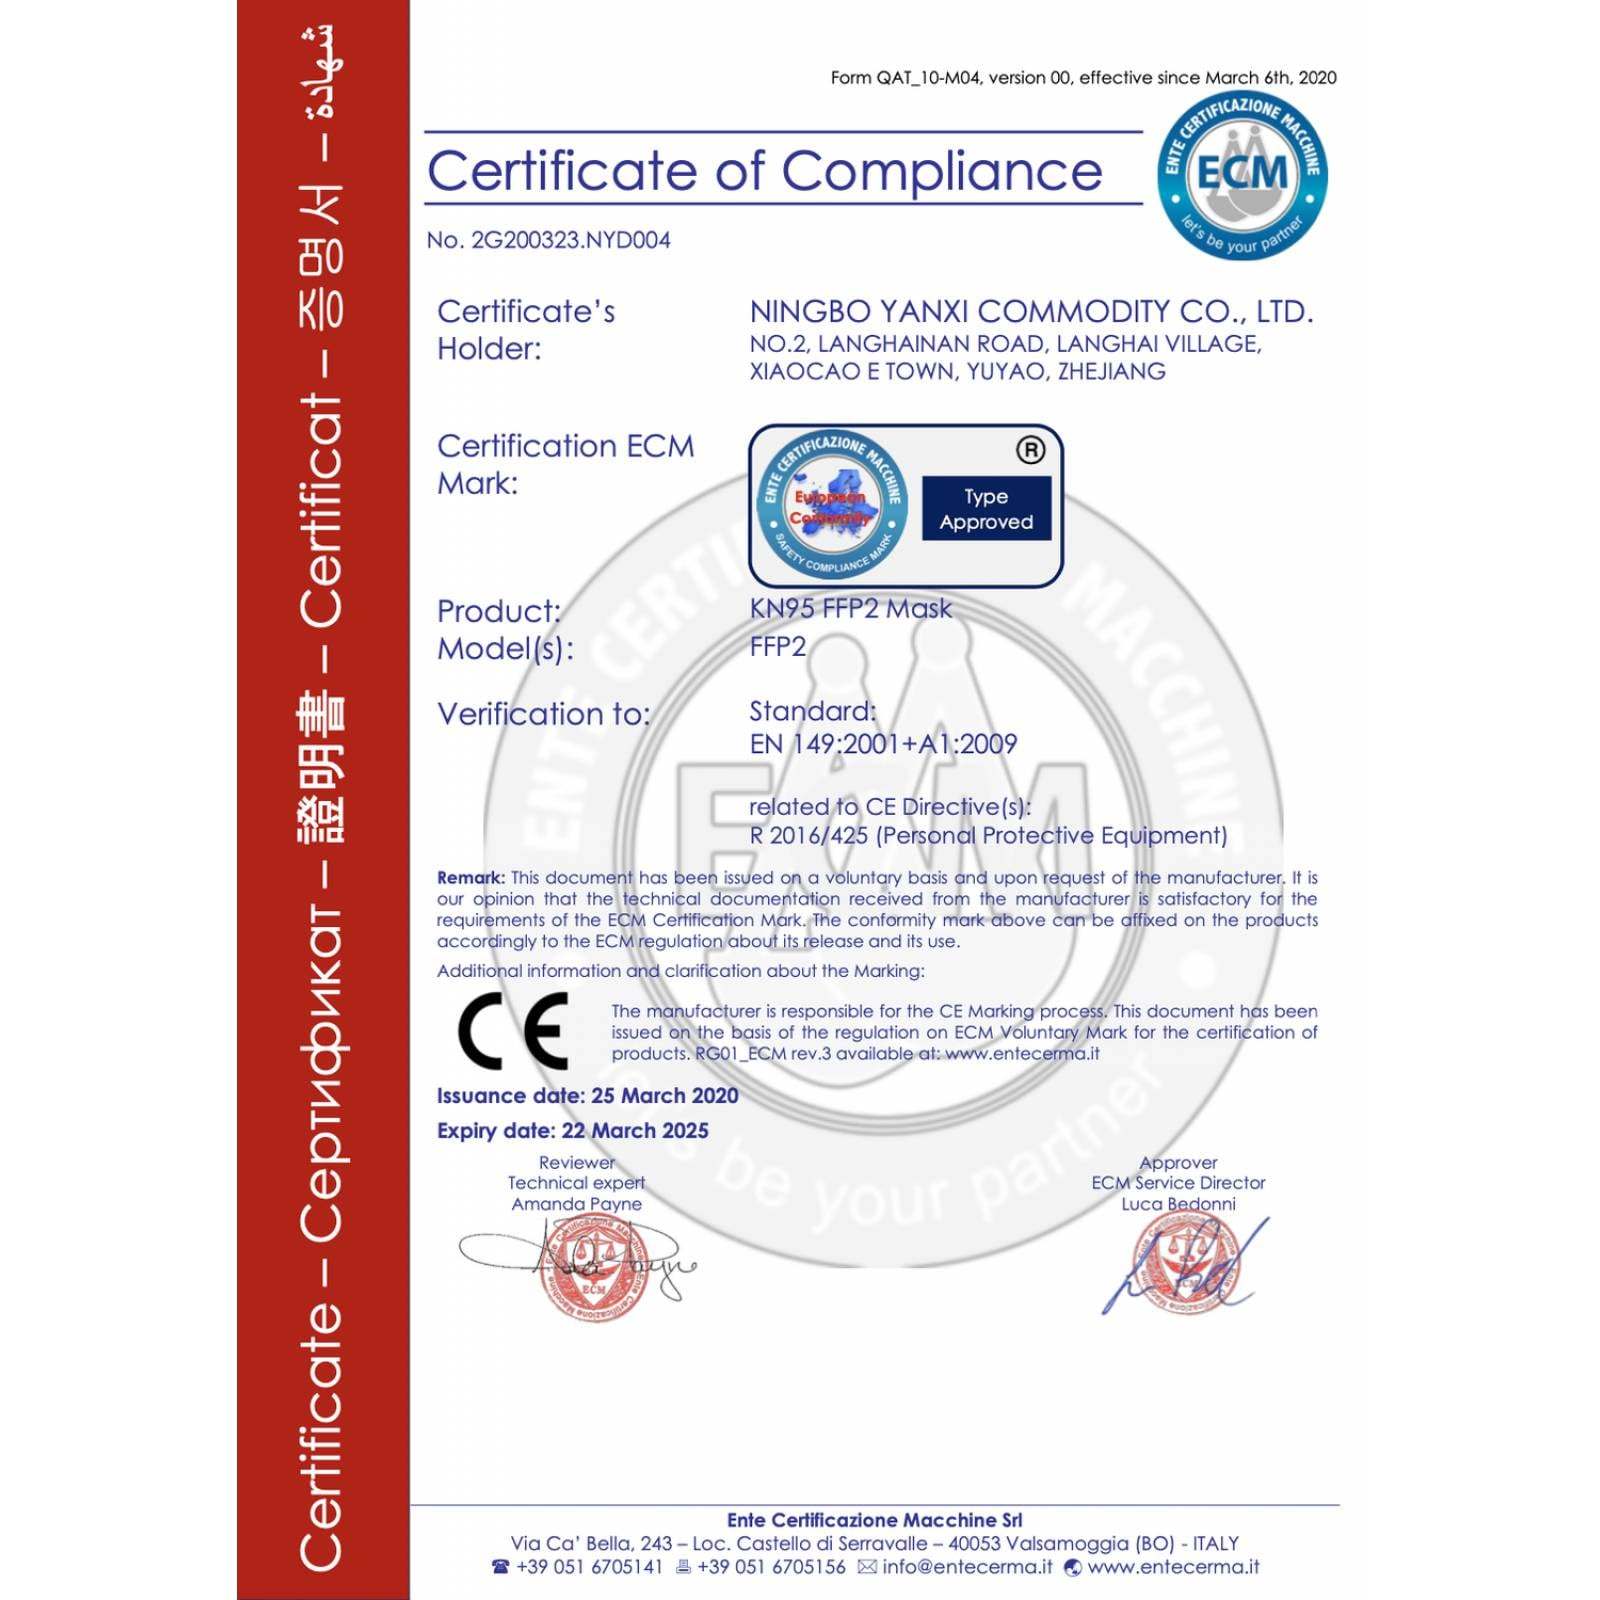 Cubrebocas KN95 Doble Válvula Filtro 5 Capas FDA CE Certificado